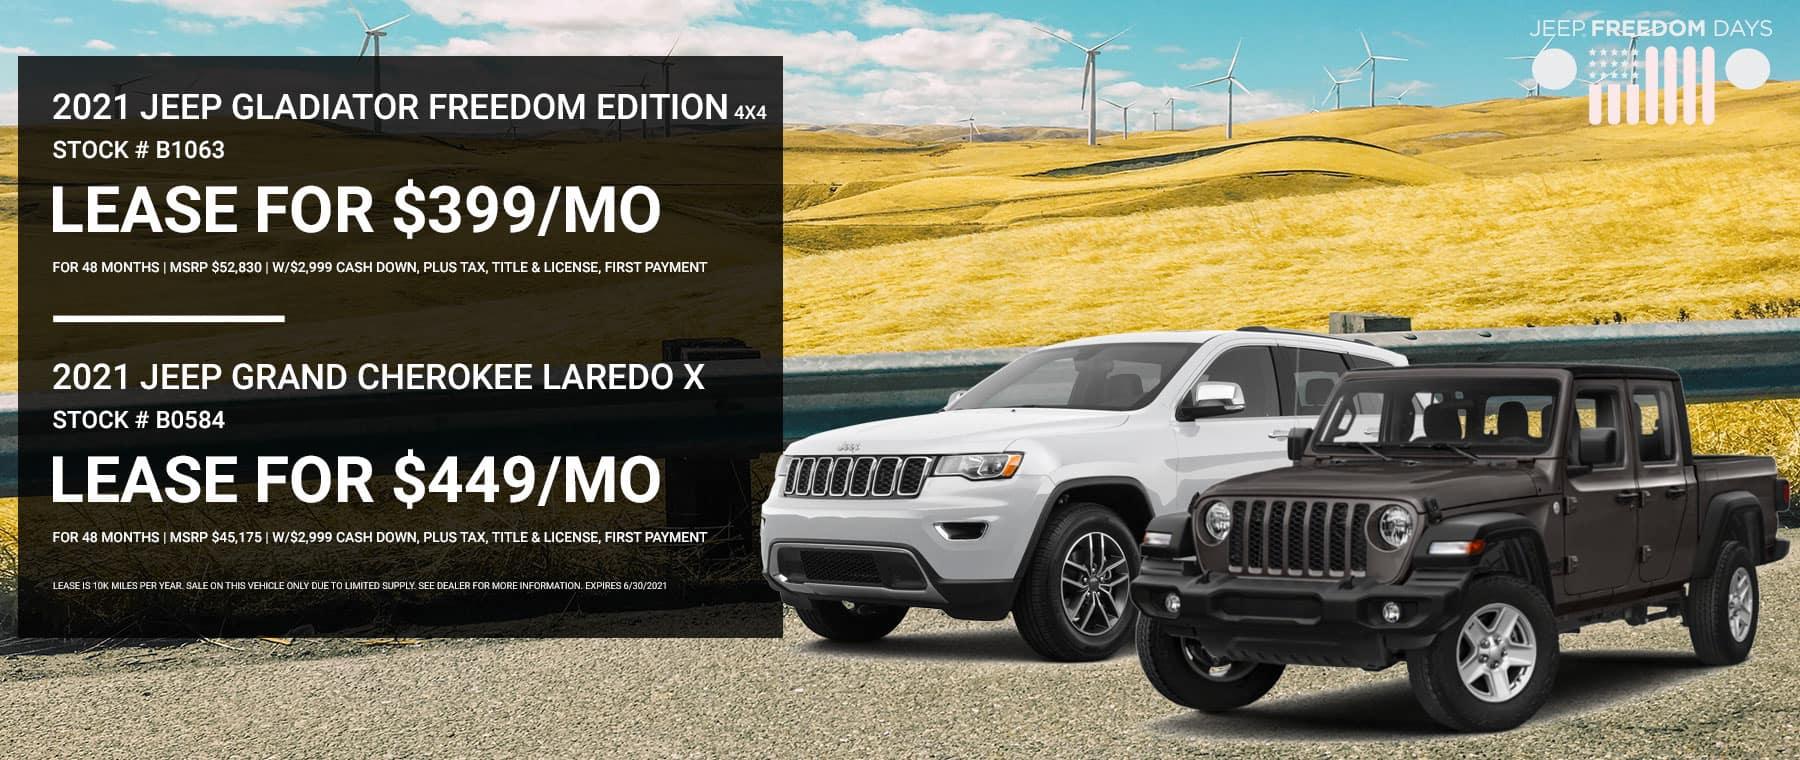 2021 Jeep Grand Cherokee Laredo X Stock # B0584 | 2021 Jeep Gladiator Freedom Edition 4x4 Stock # B1063